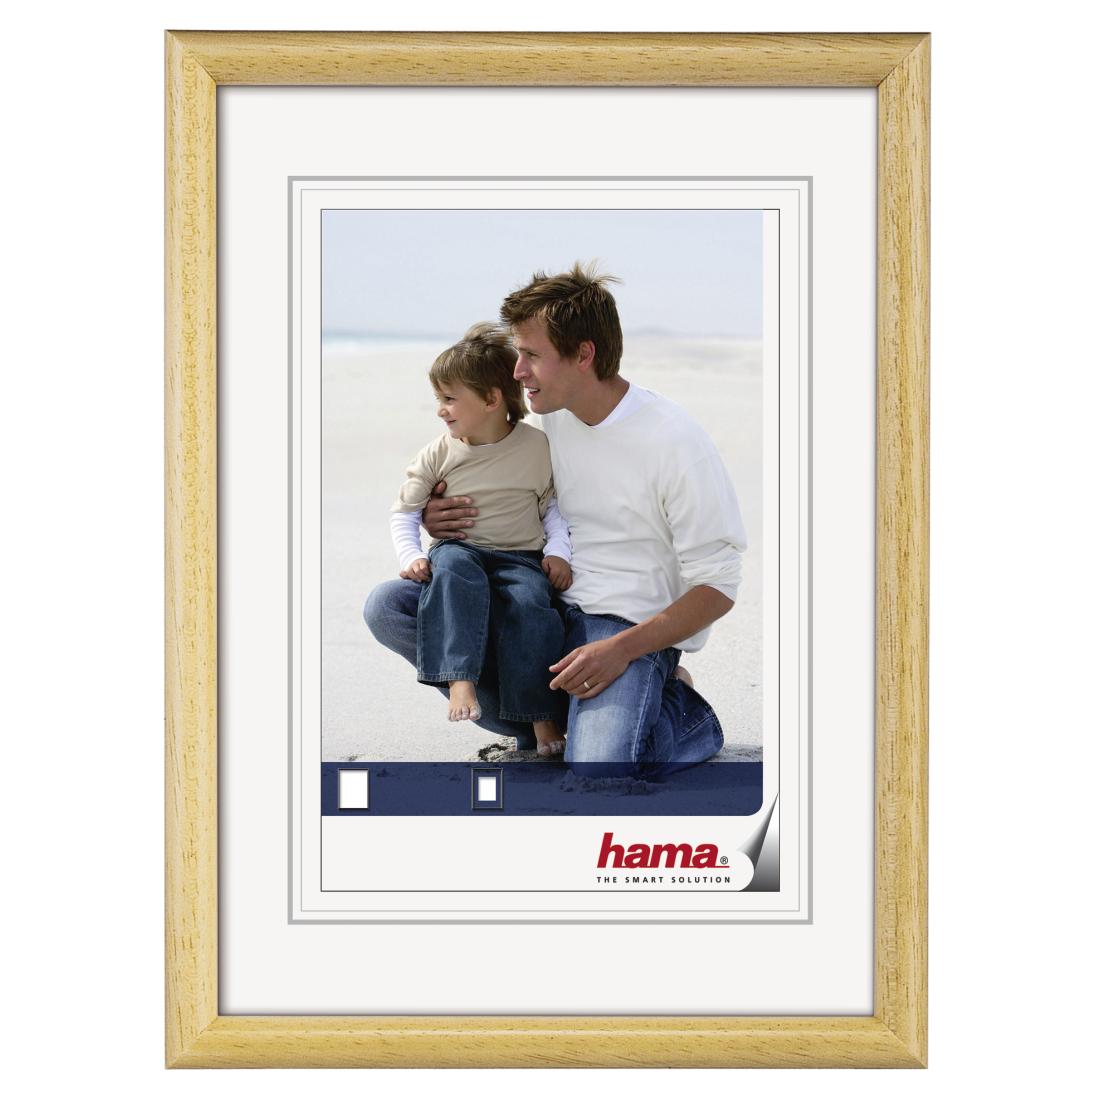 00064565 Hama Wooden Frame Oregon Nature 30 X 40 Cm Hama De